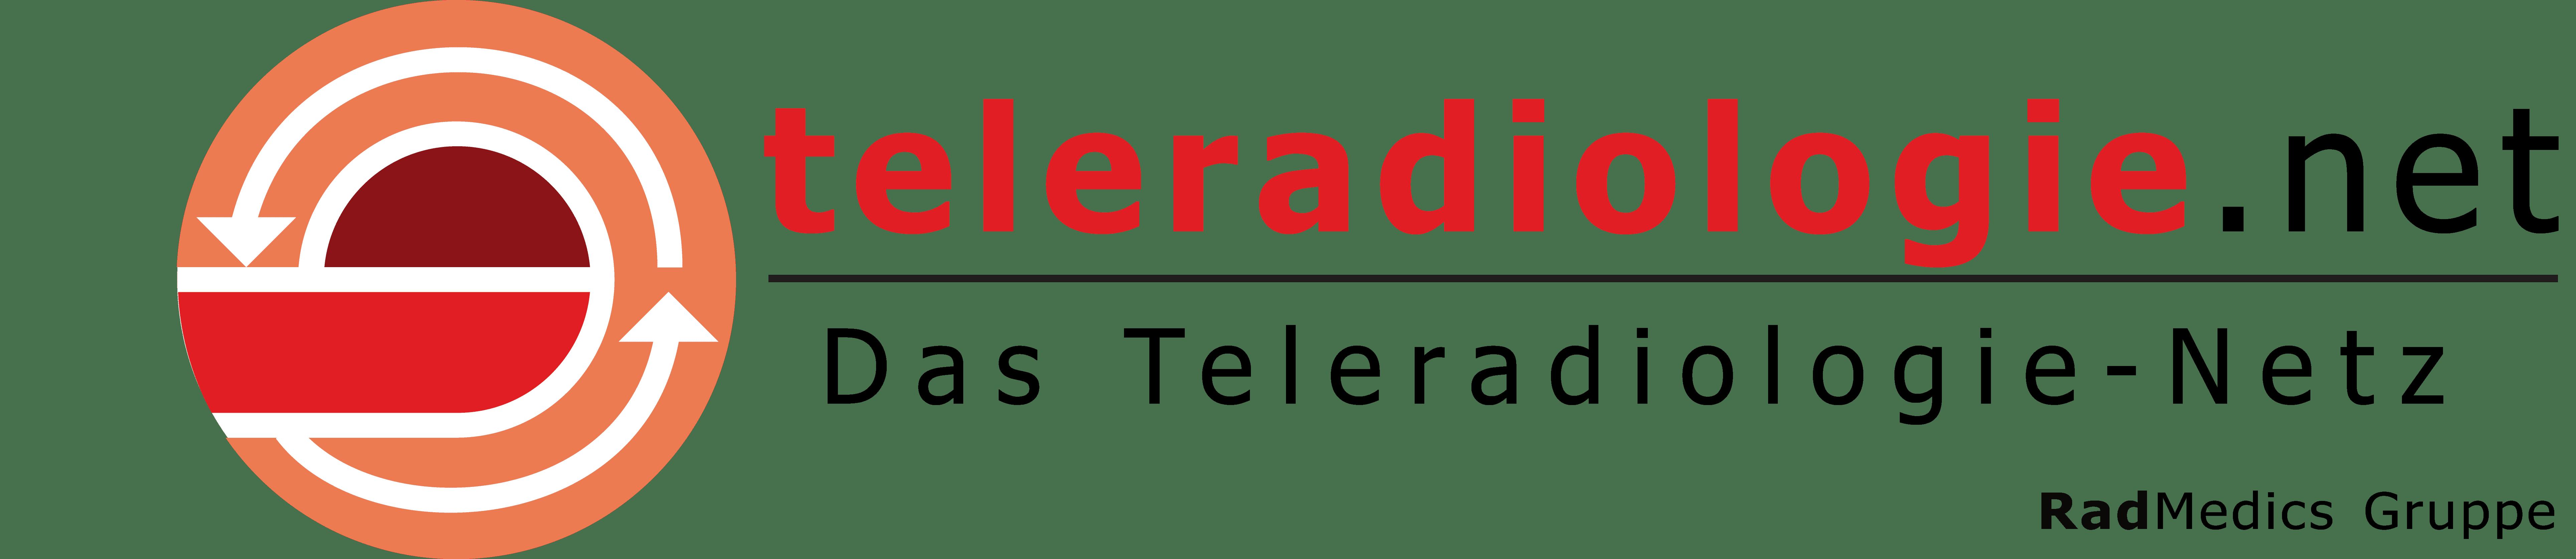 Teleradiologie.net